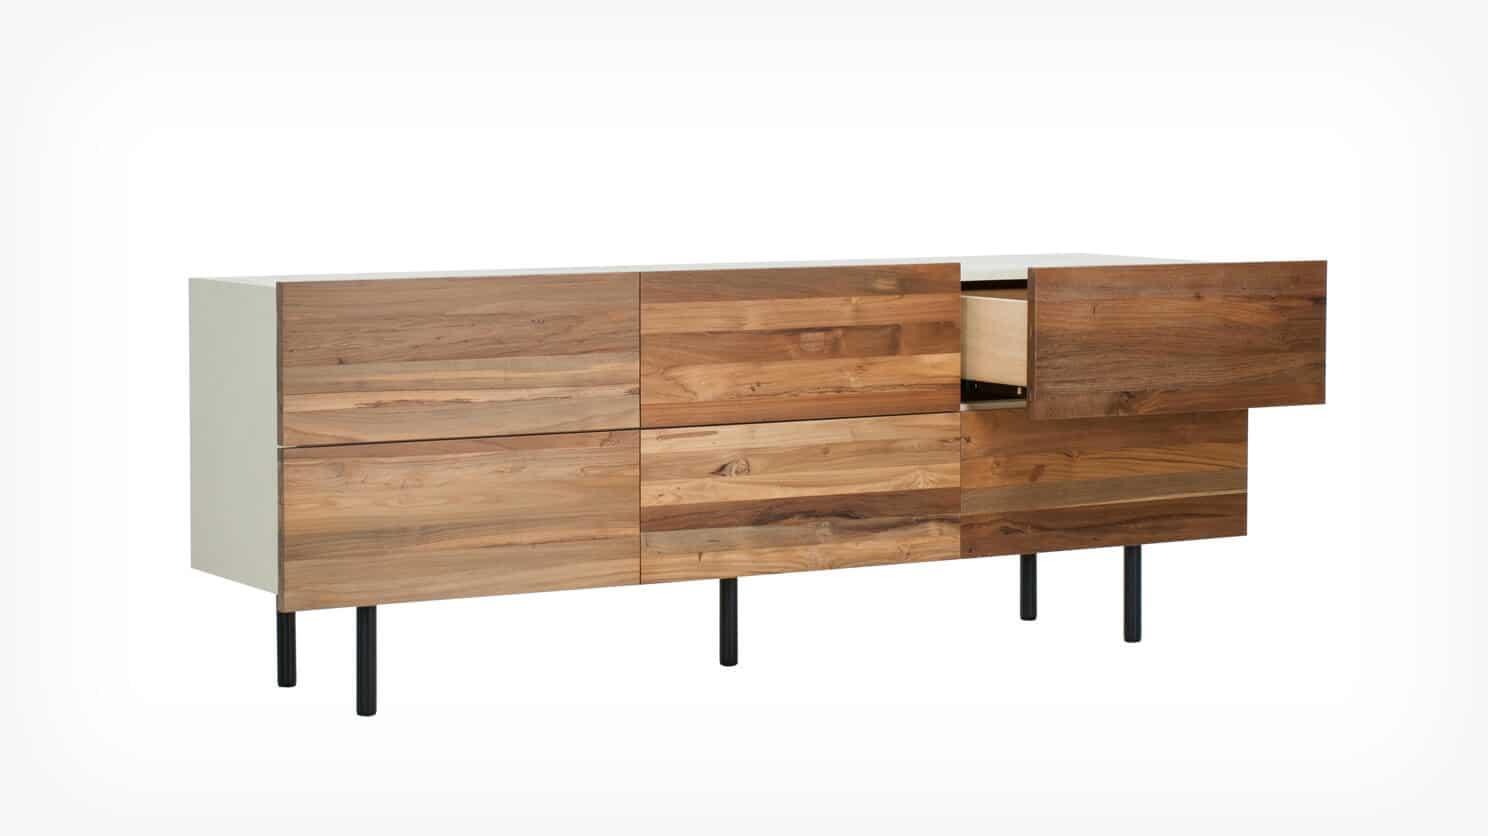 7040 449 par 4 dressers reclaimed low dresser teak corner w drawer